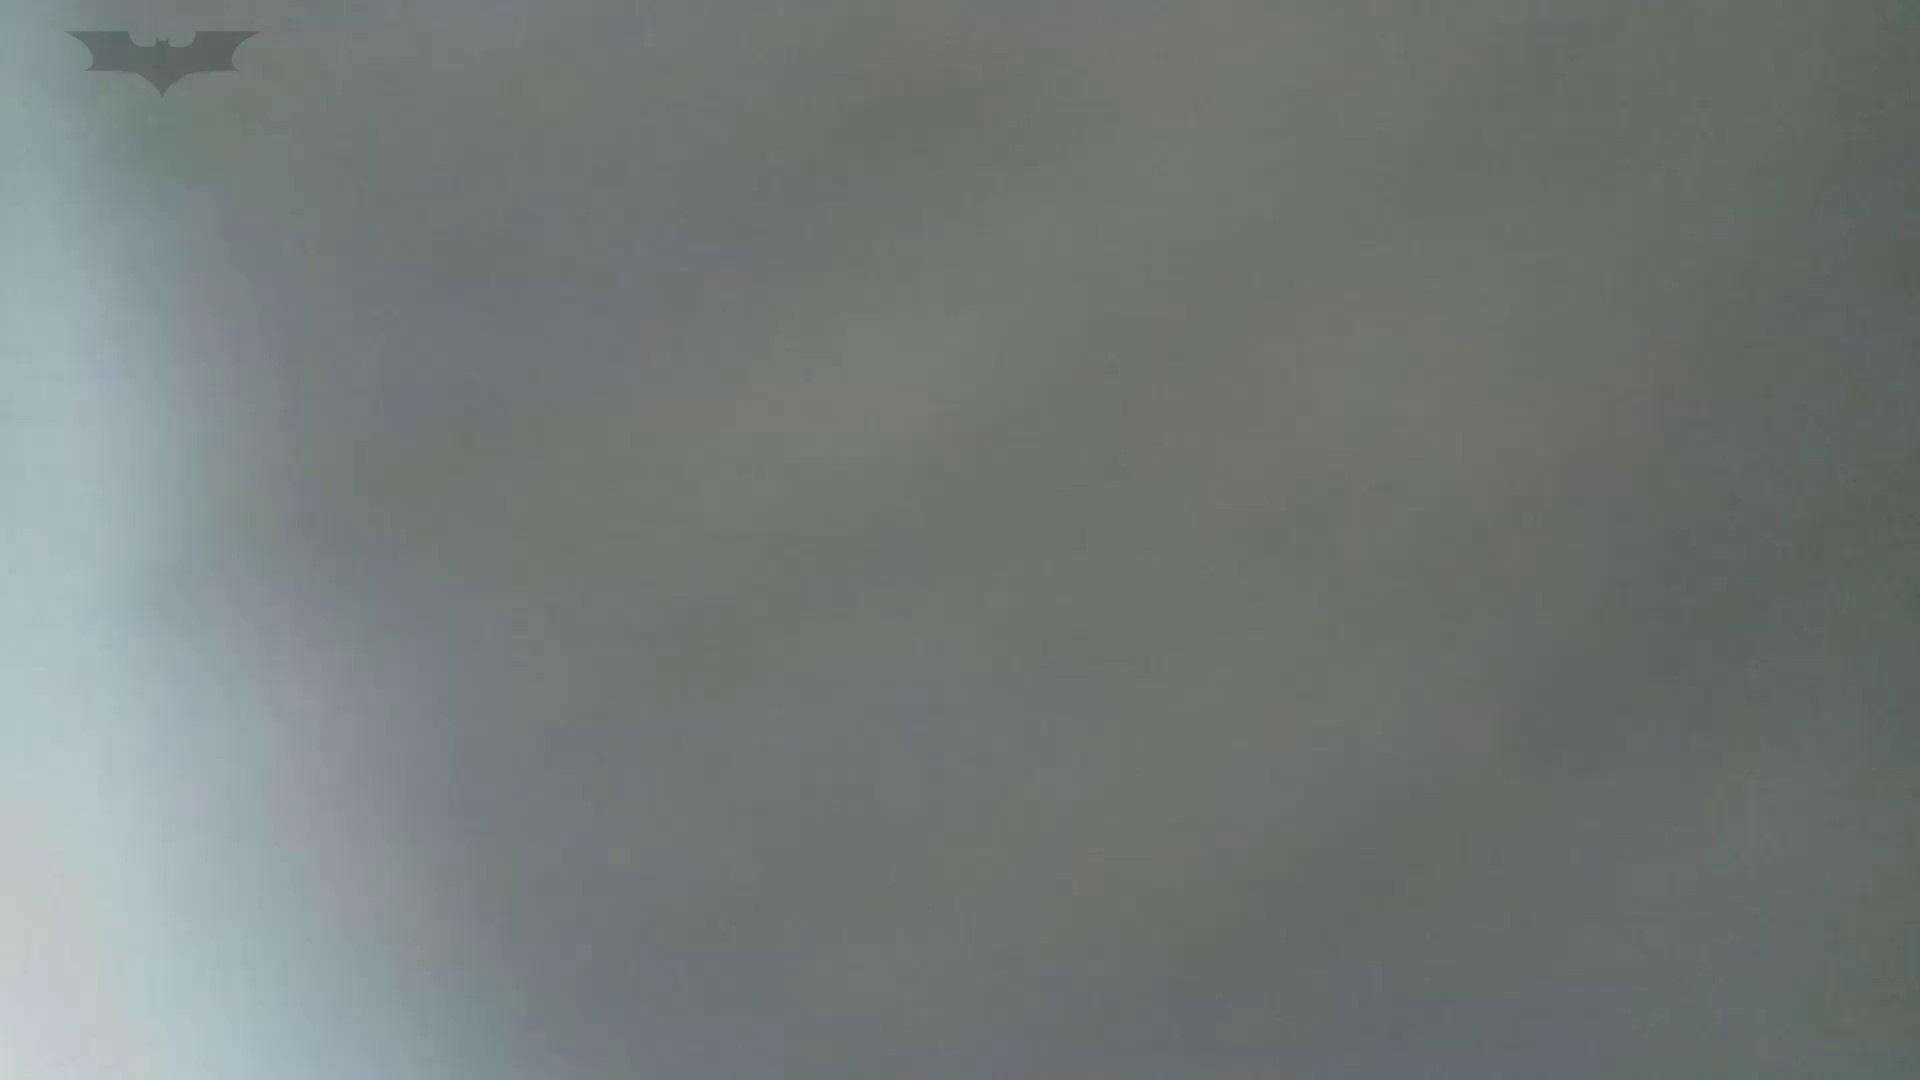 化粧室絵巻 番外編 VOL.14 隠れた名作 戯れ無修正画像 99画像 55